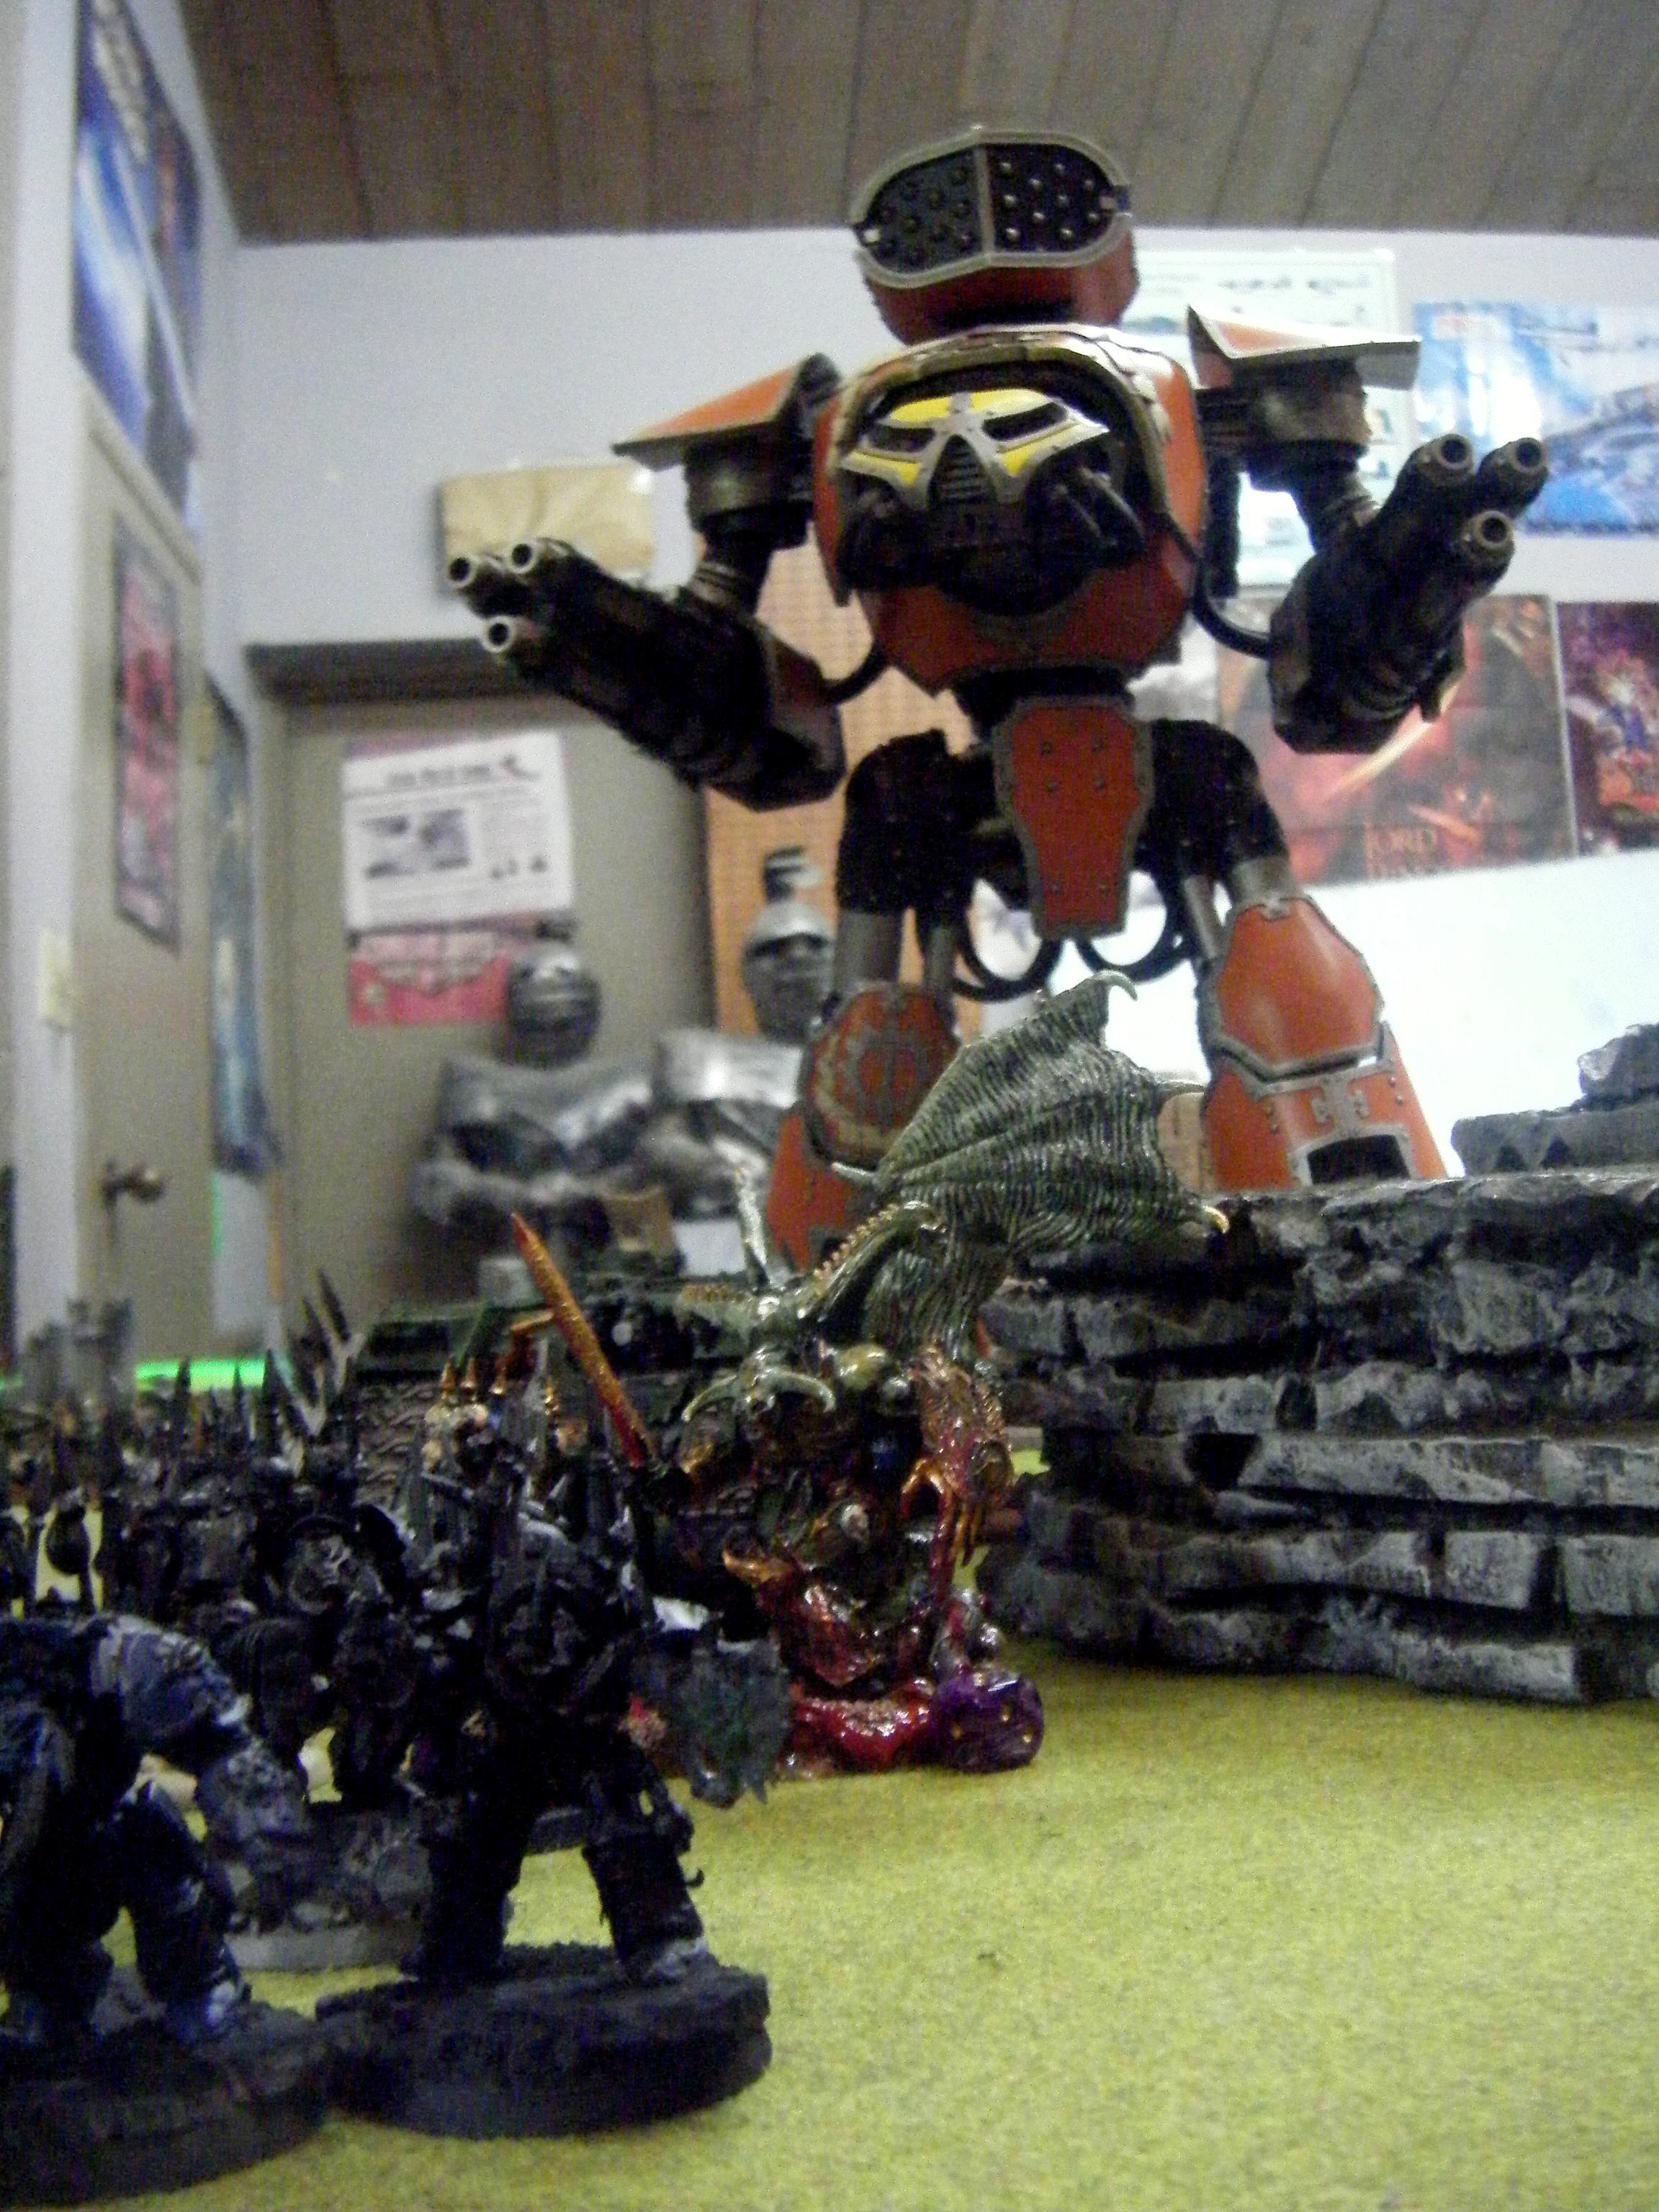 Apocalypse, The Reaver backs up Chaos